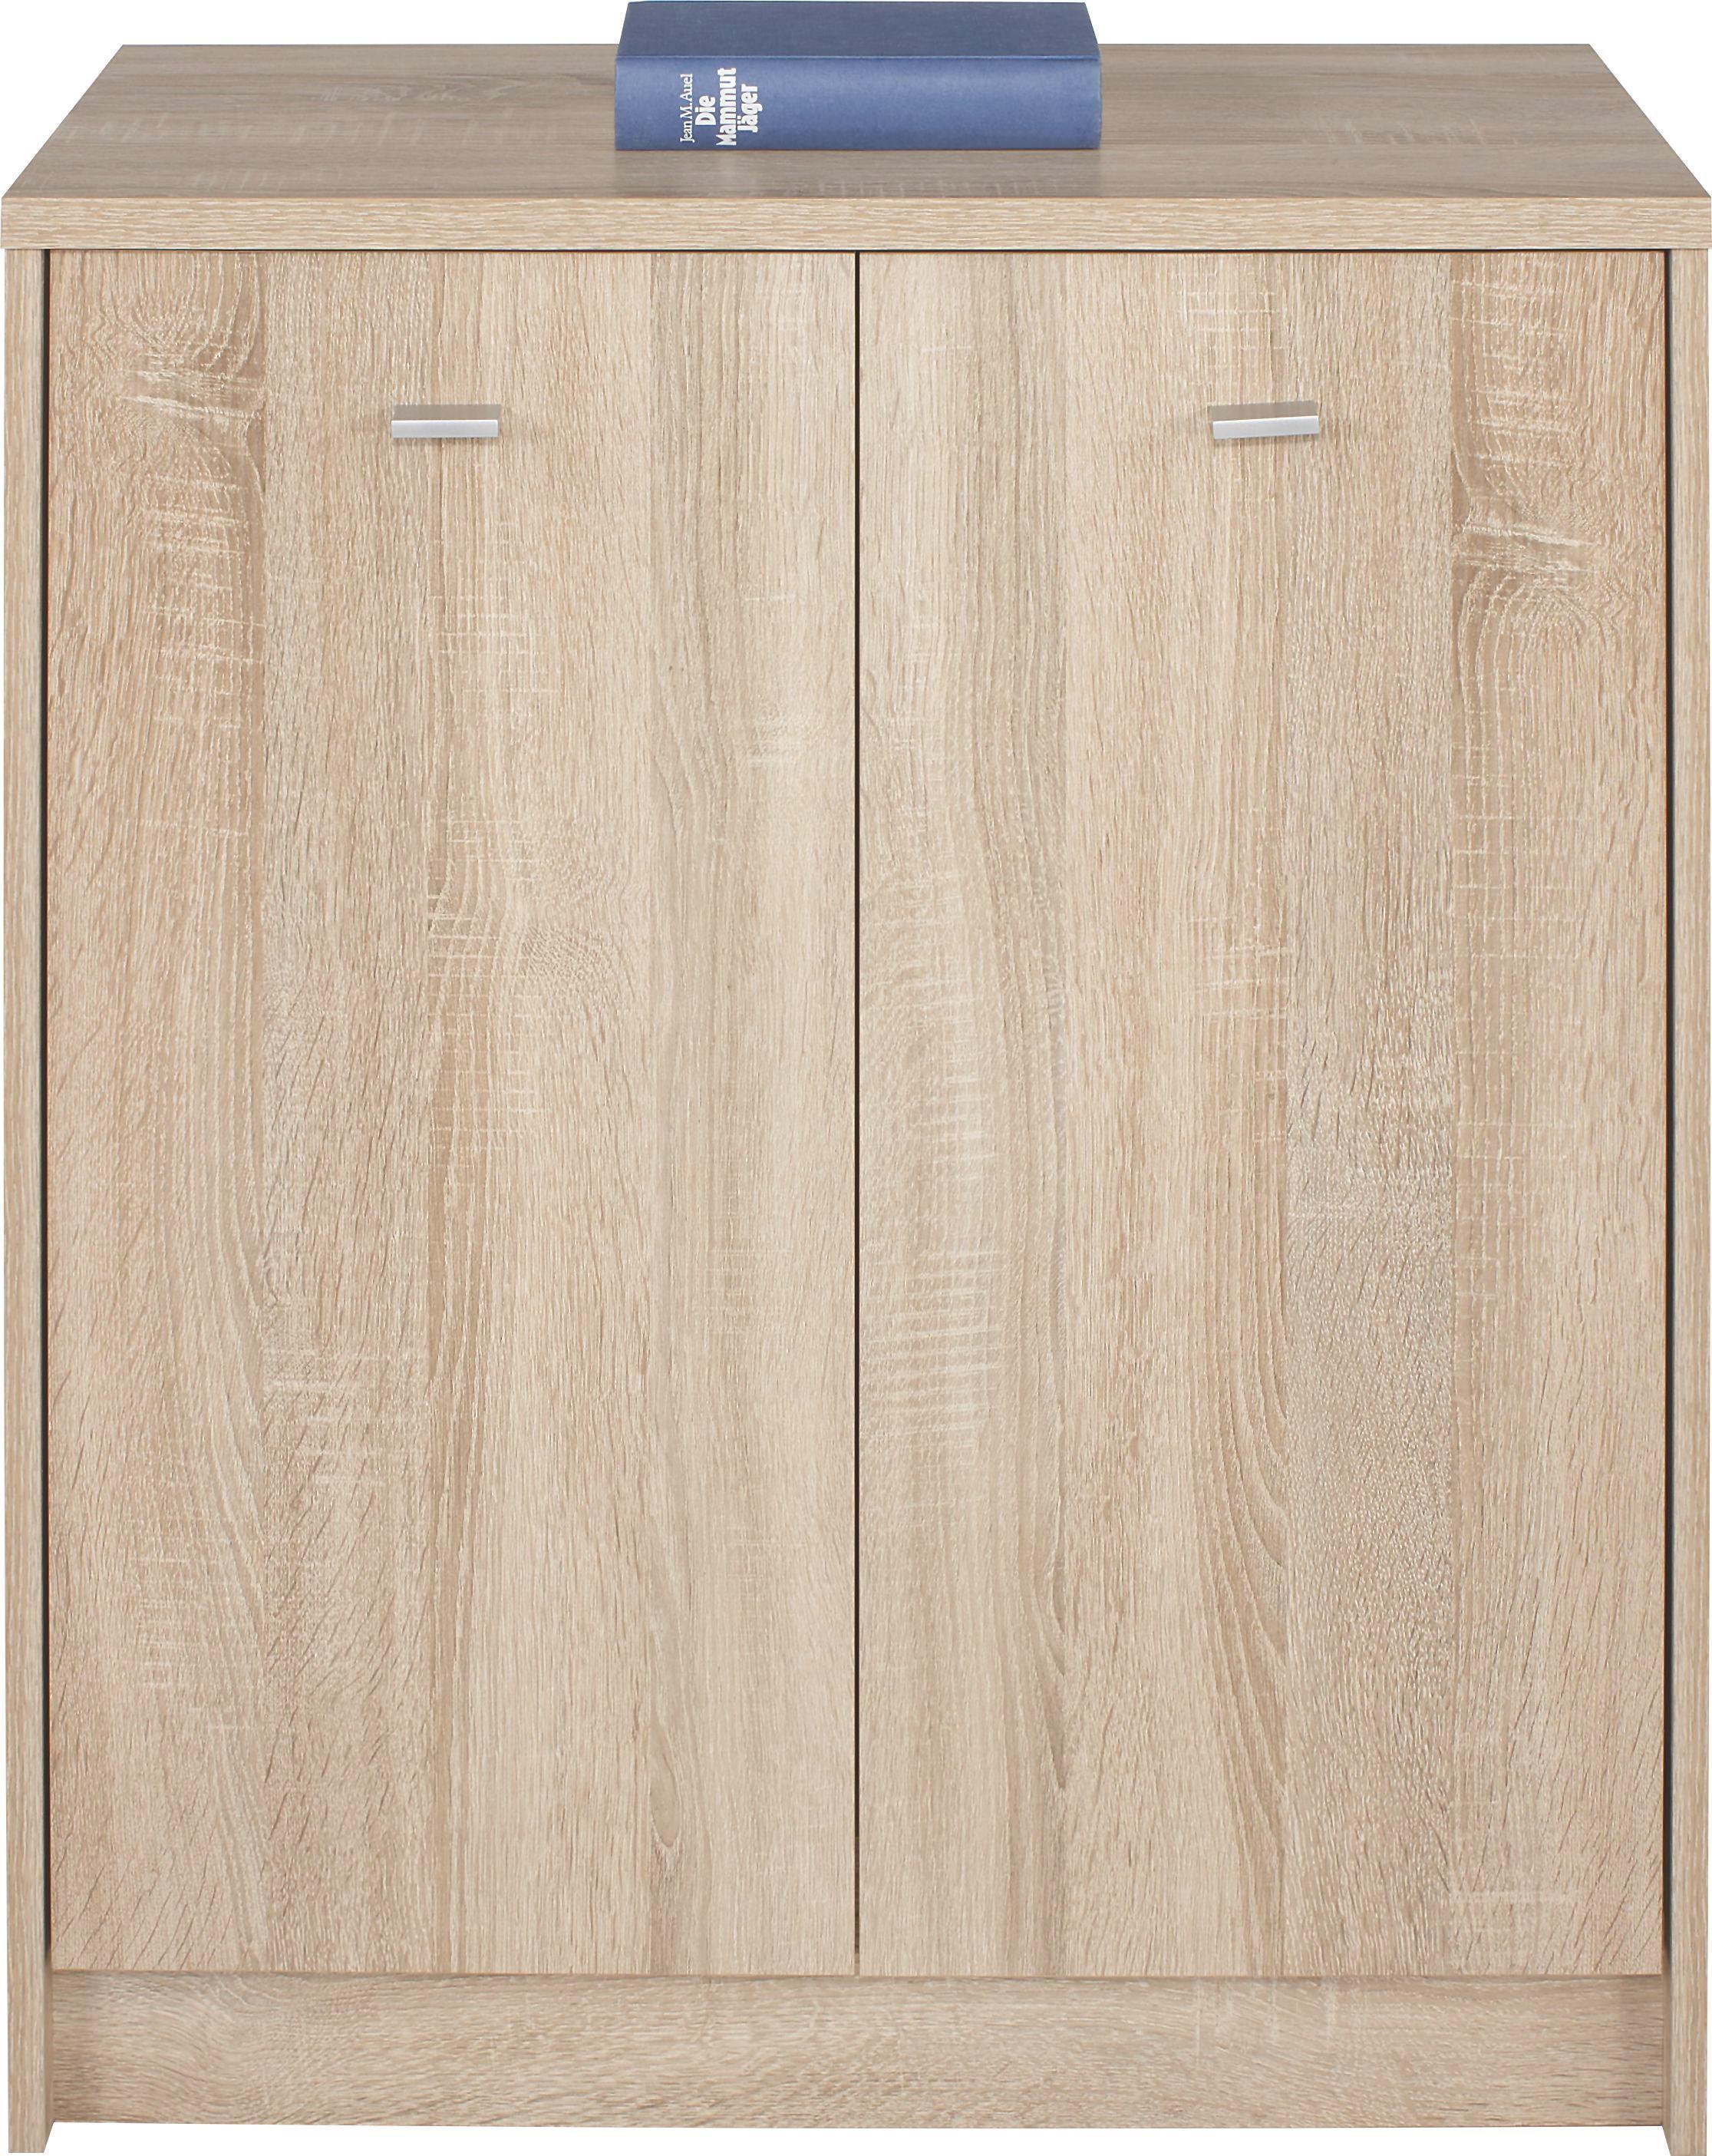 Komoda Komoda - boje hrasta, Moderno, drvni materijal (74/85,4/35,2cm)